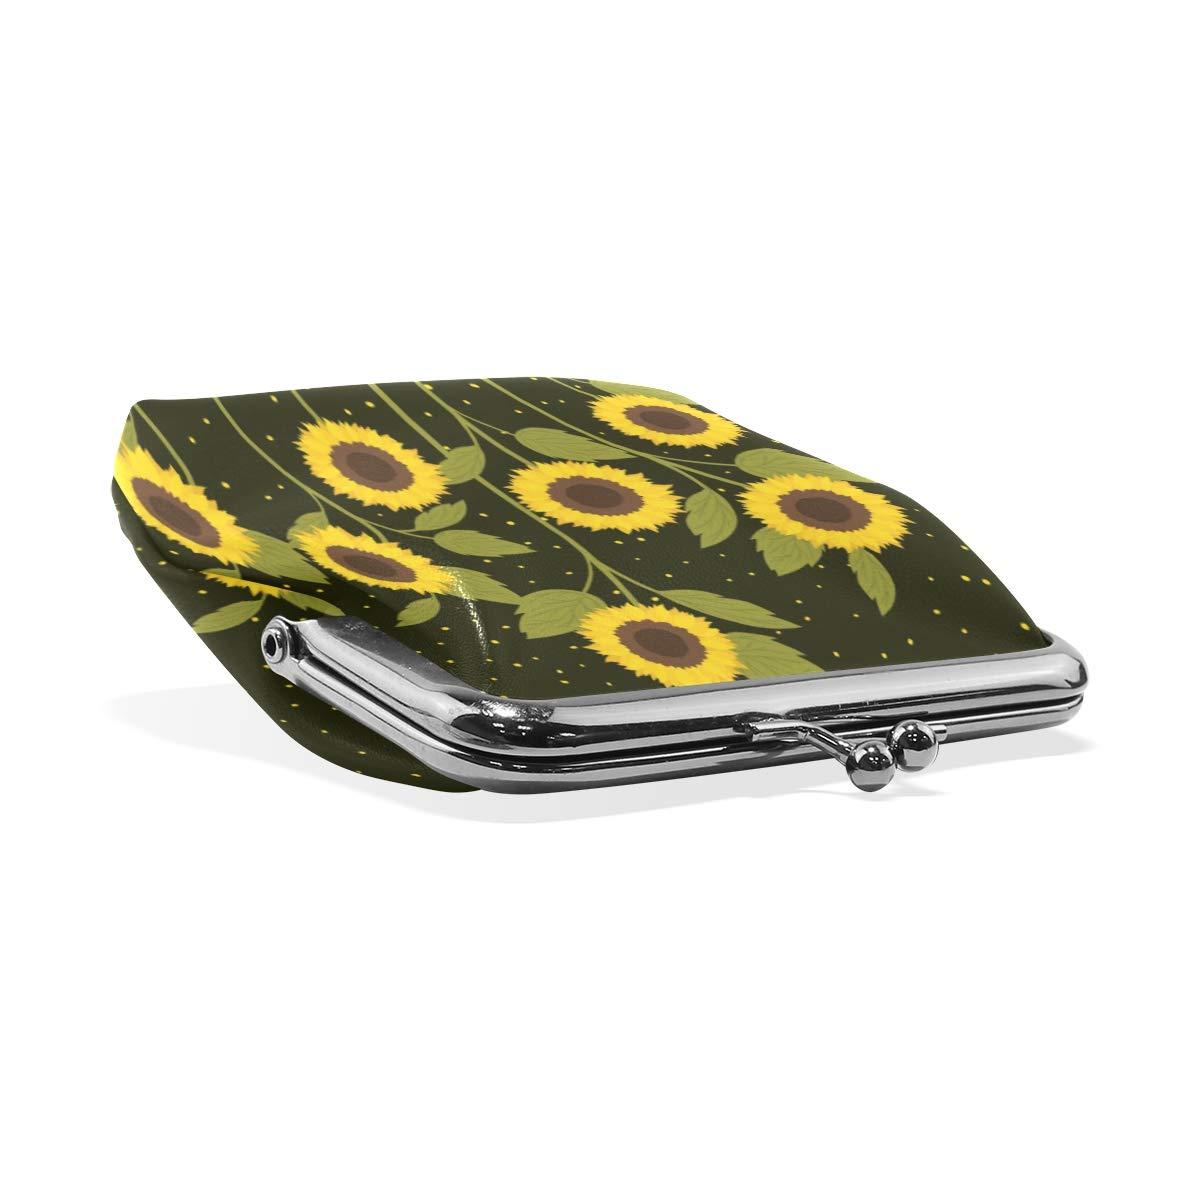 Fashion Womens Coin Purse Beautiful Sunflowers Starry Sky Vintage Pouch Kiss-lock Mini Purse Wallets